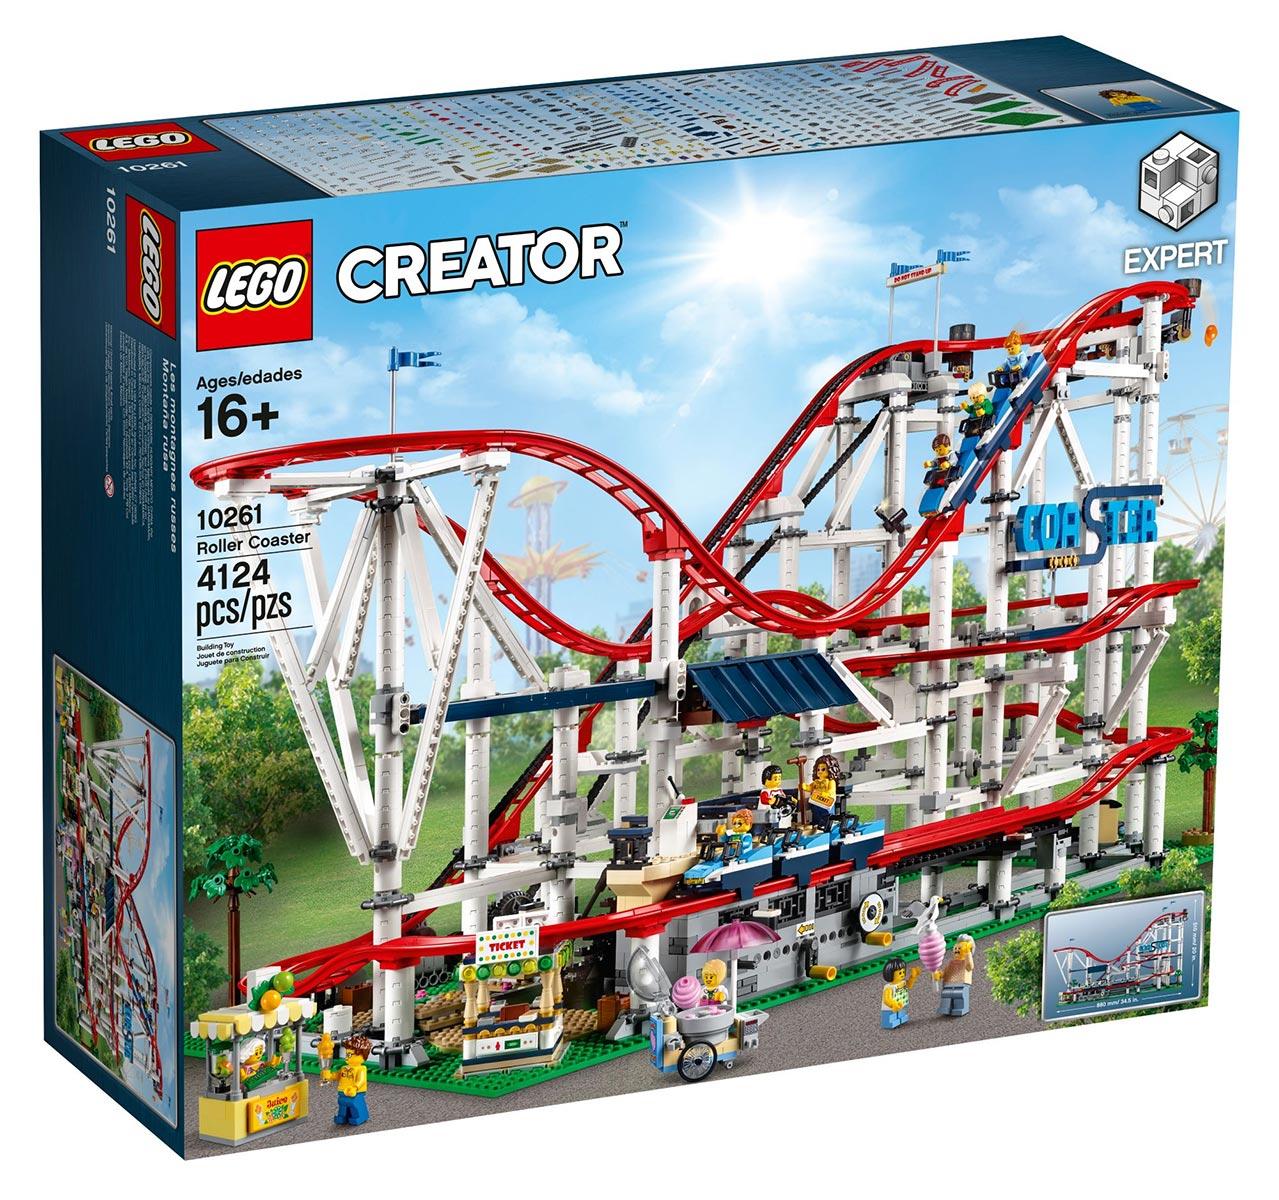 Massive New LEGO Creator Roller Coaster